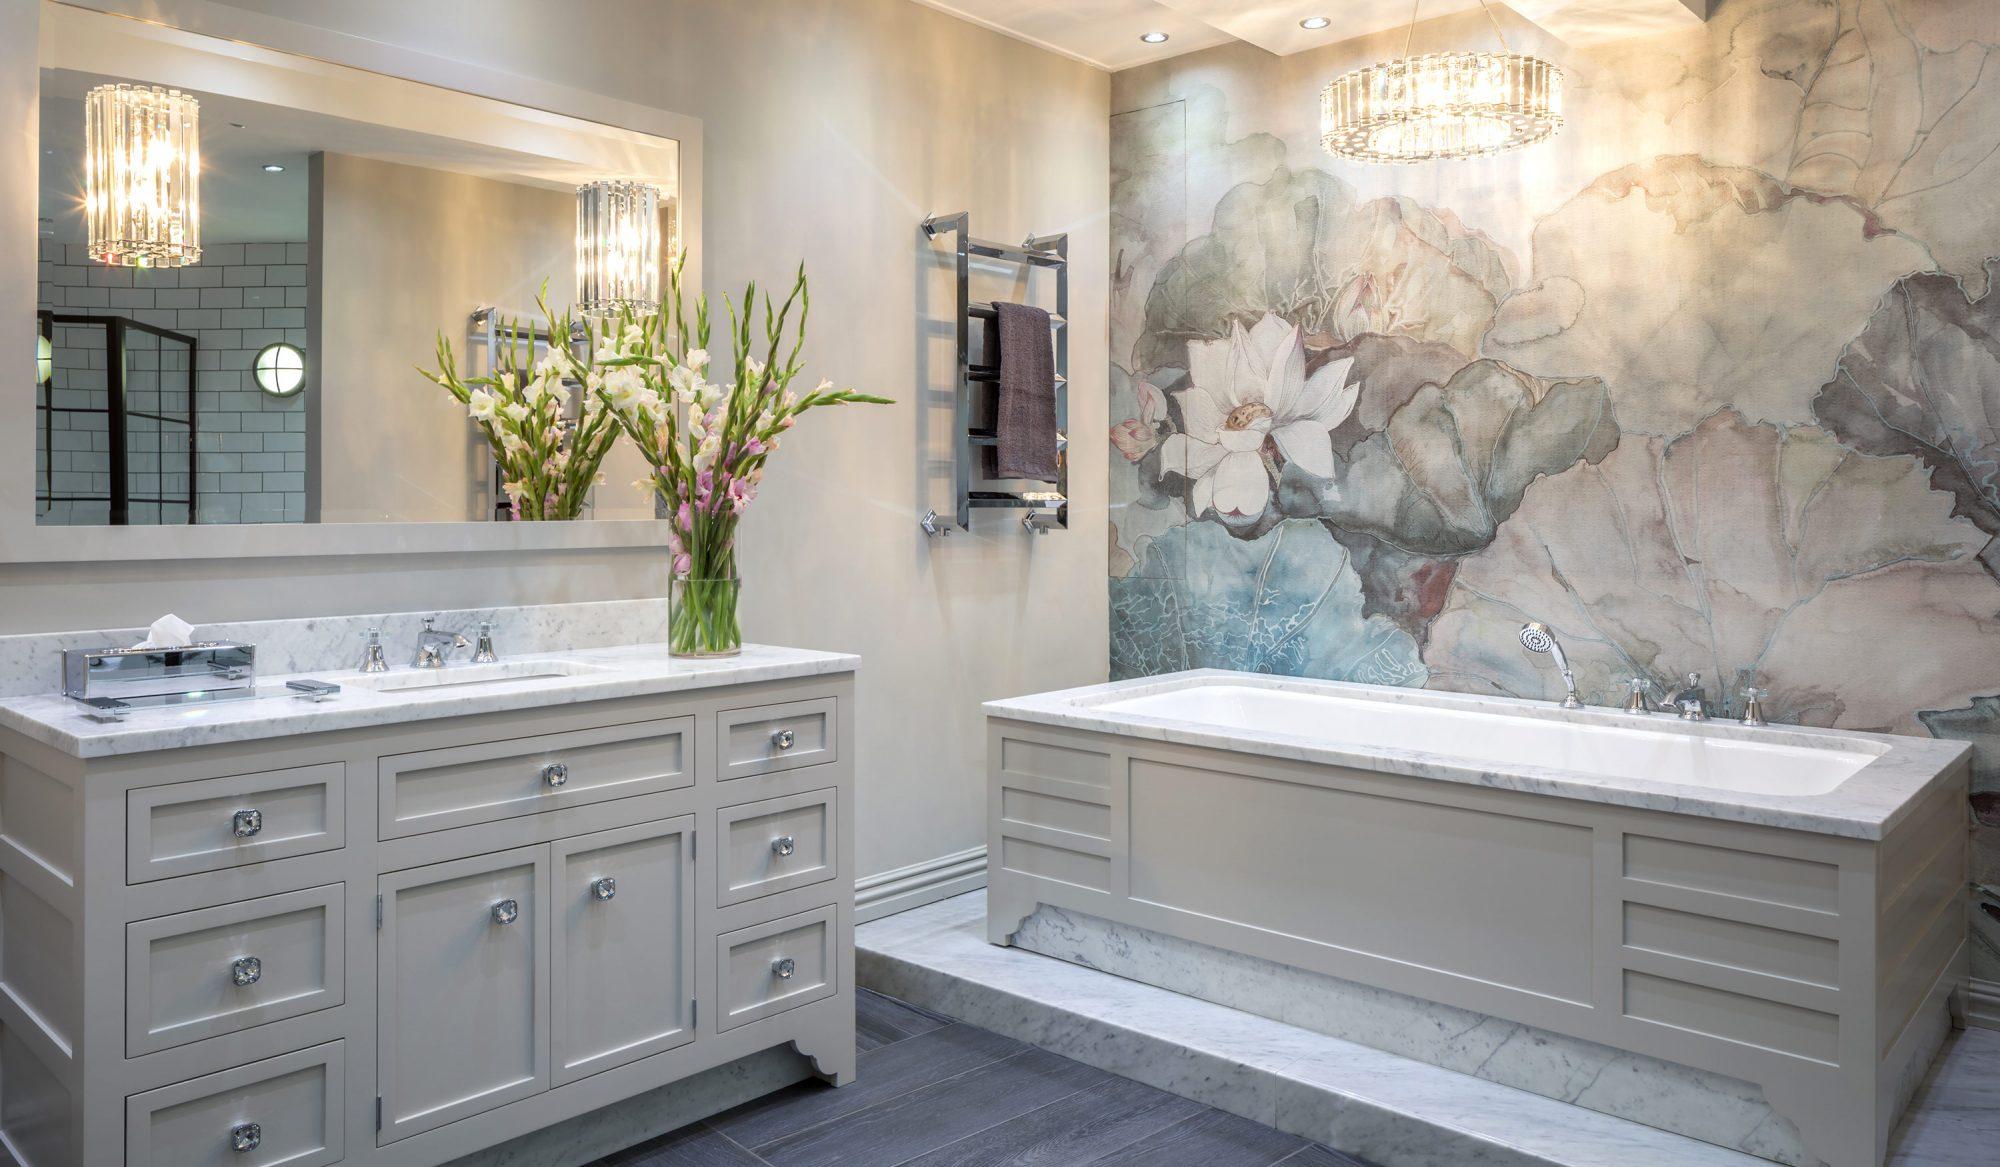 West One Bathrooms Knightsbridge Showroom Thurloe Place Hero